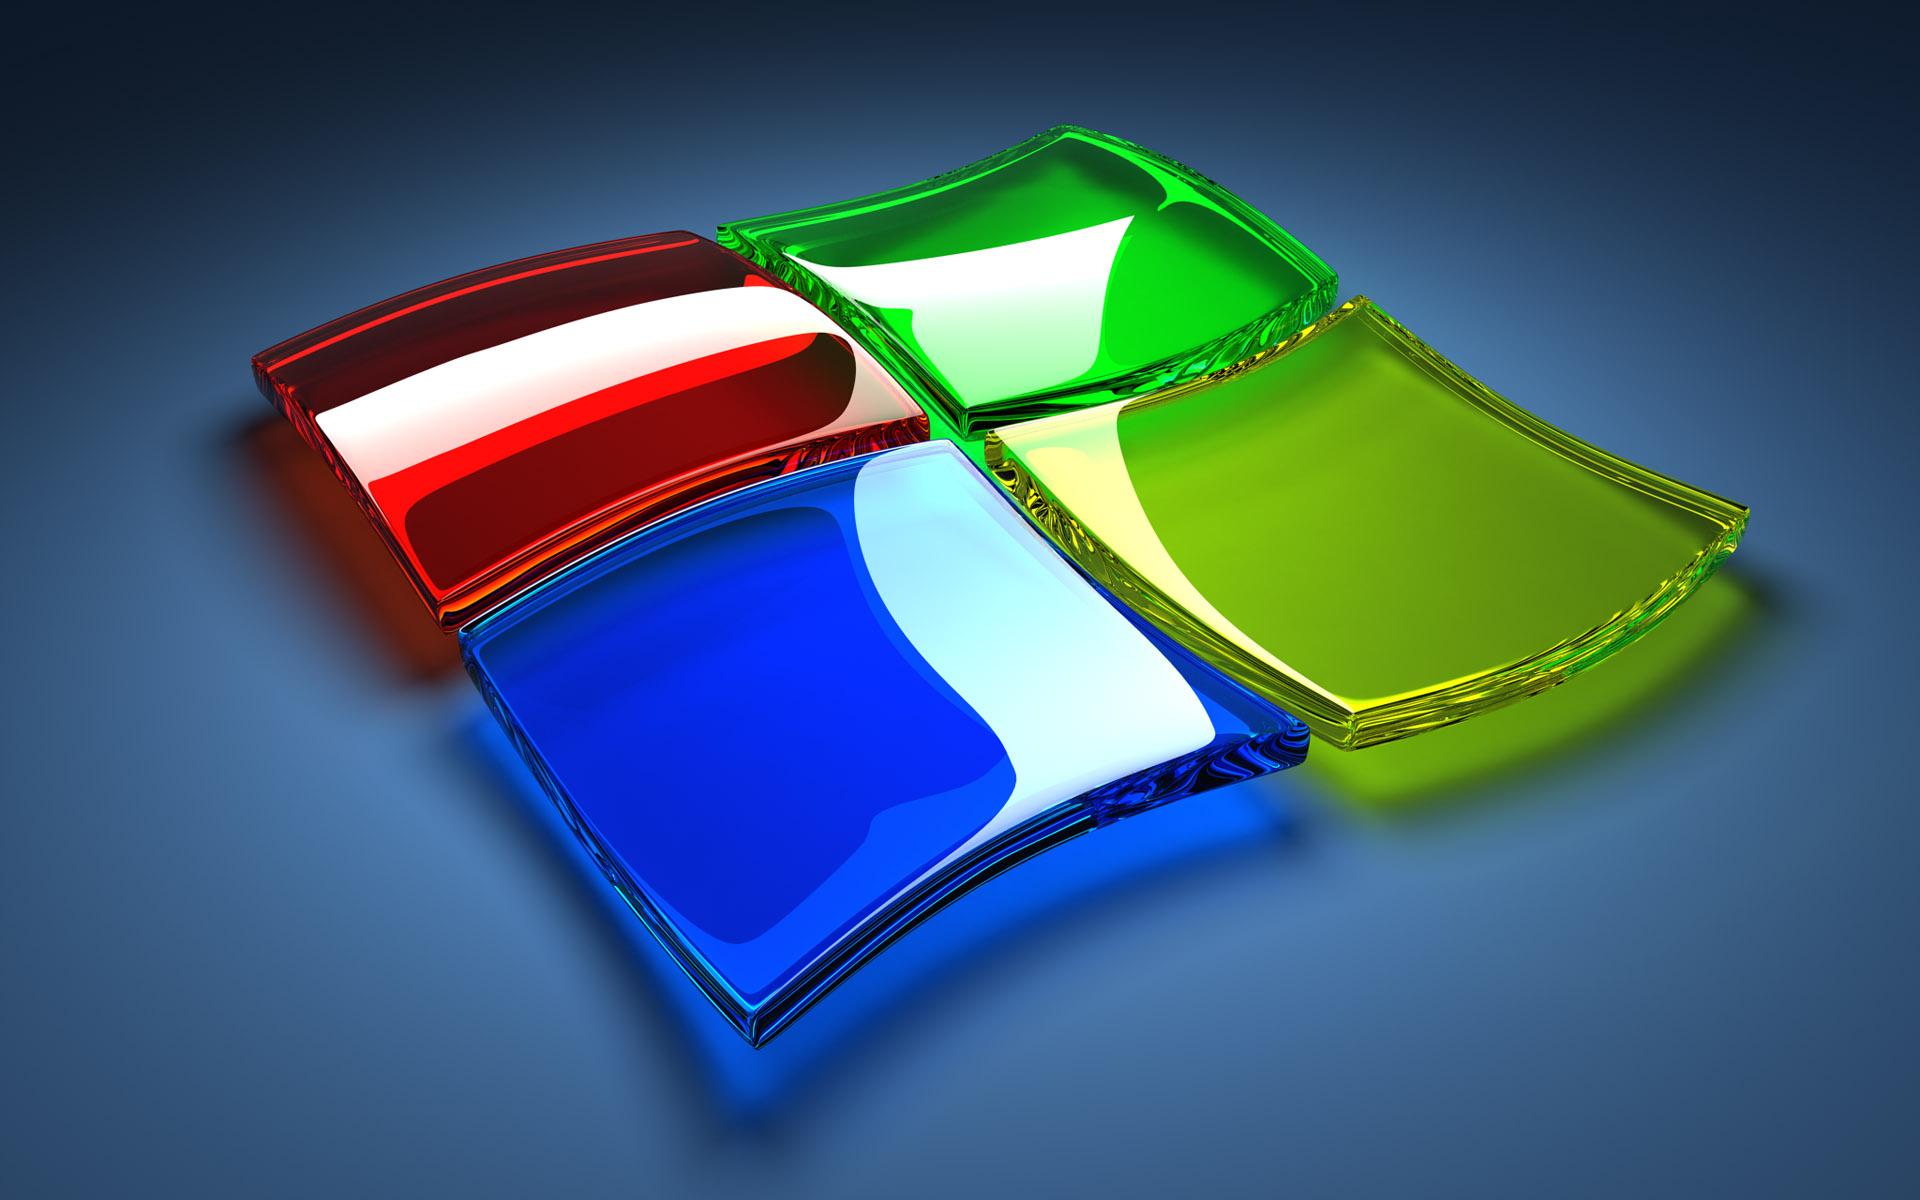 Wallpaper download microsoft - Download Microsoft Windows 8 Wallpapers Pack 2 Wallpapers Techmynd